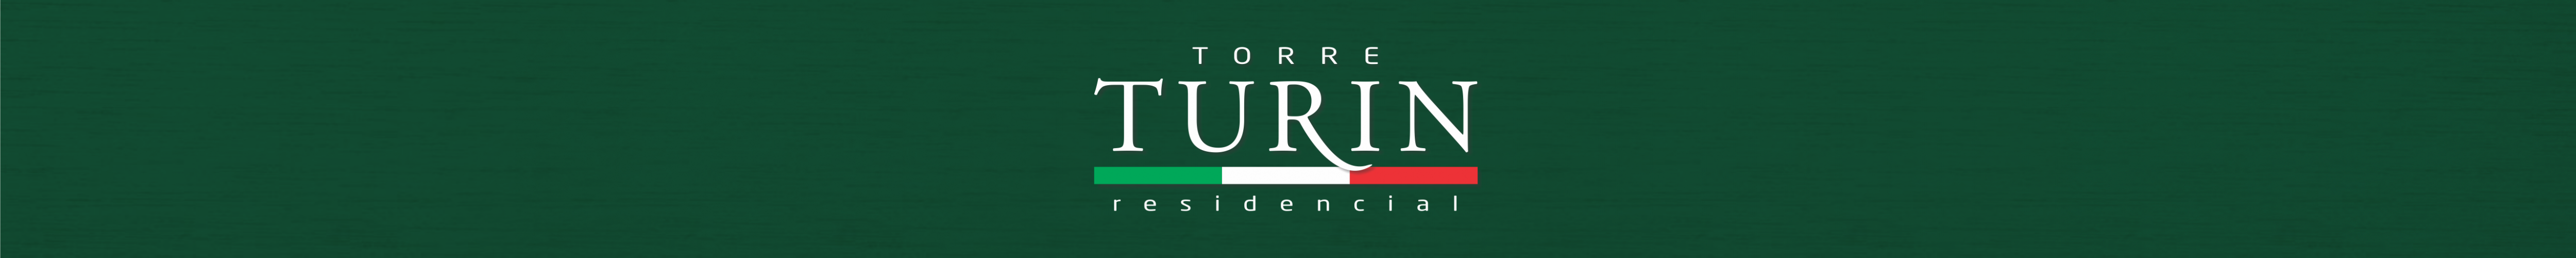 TORRE - TORRE TURIN